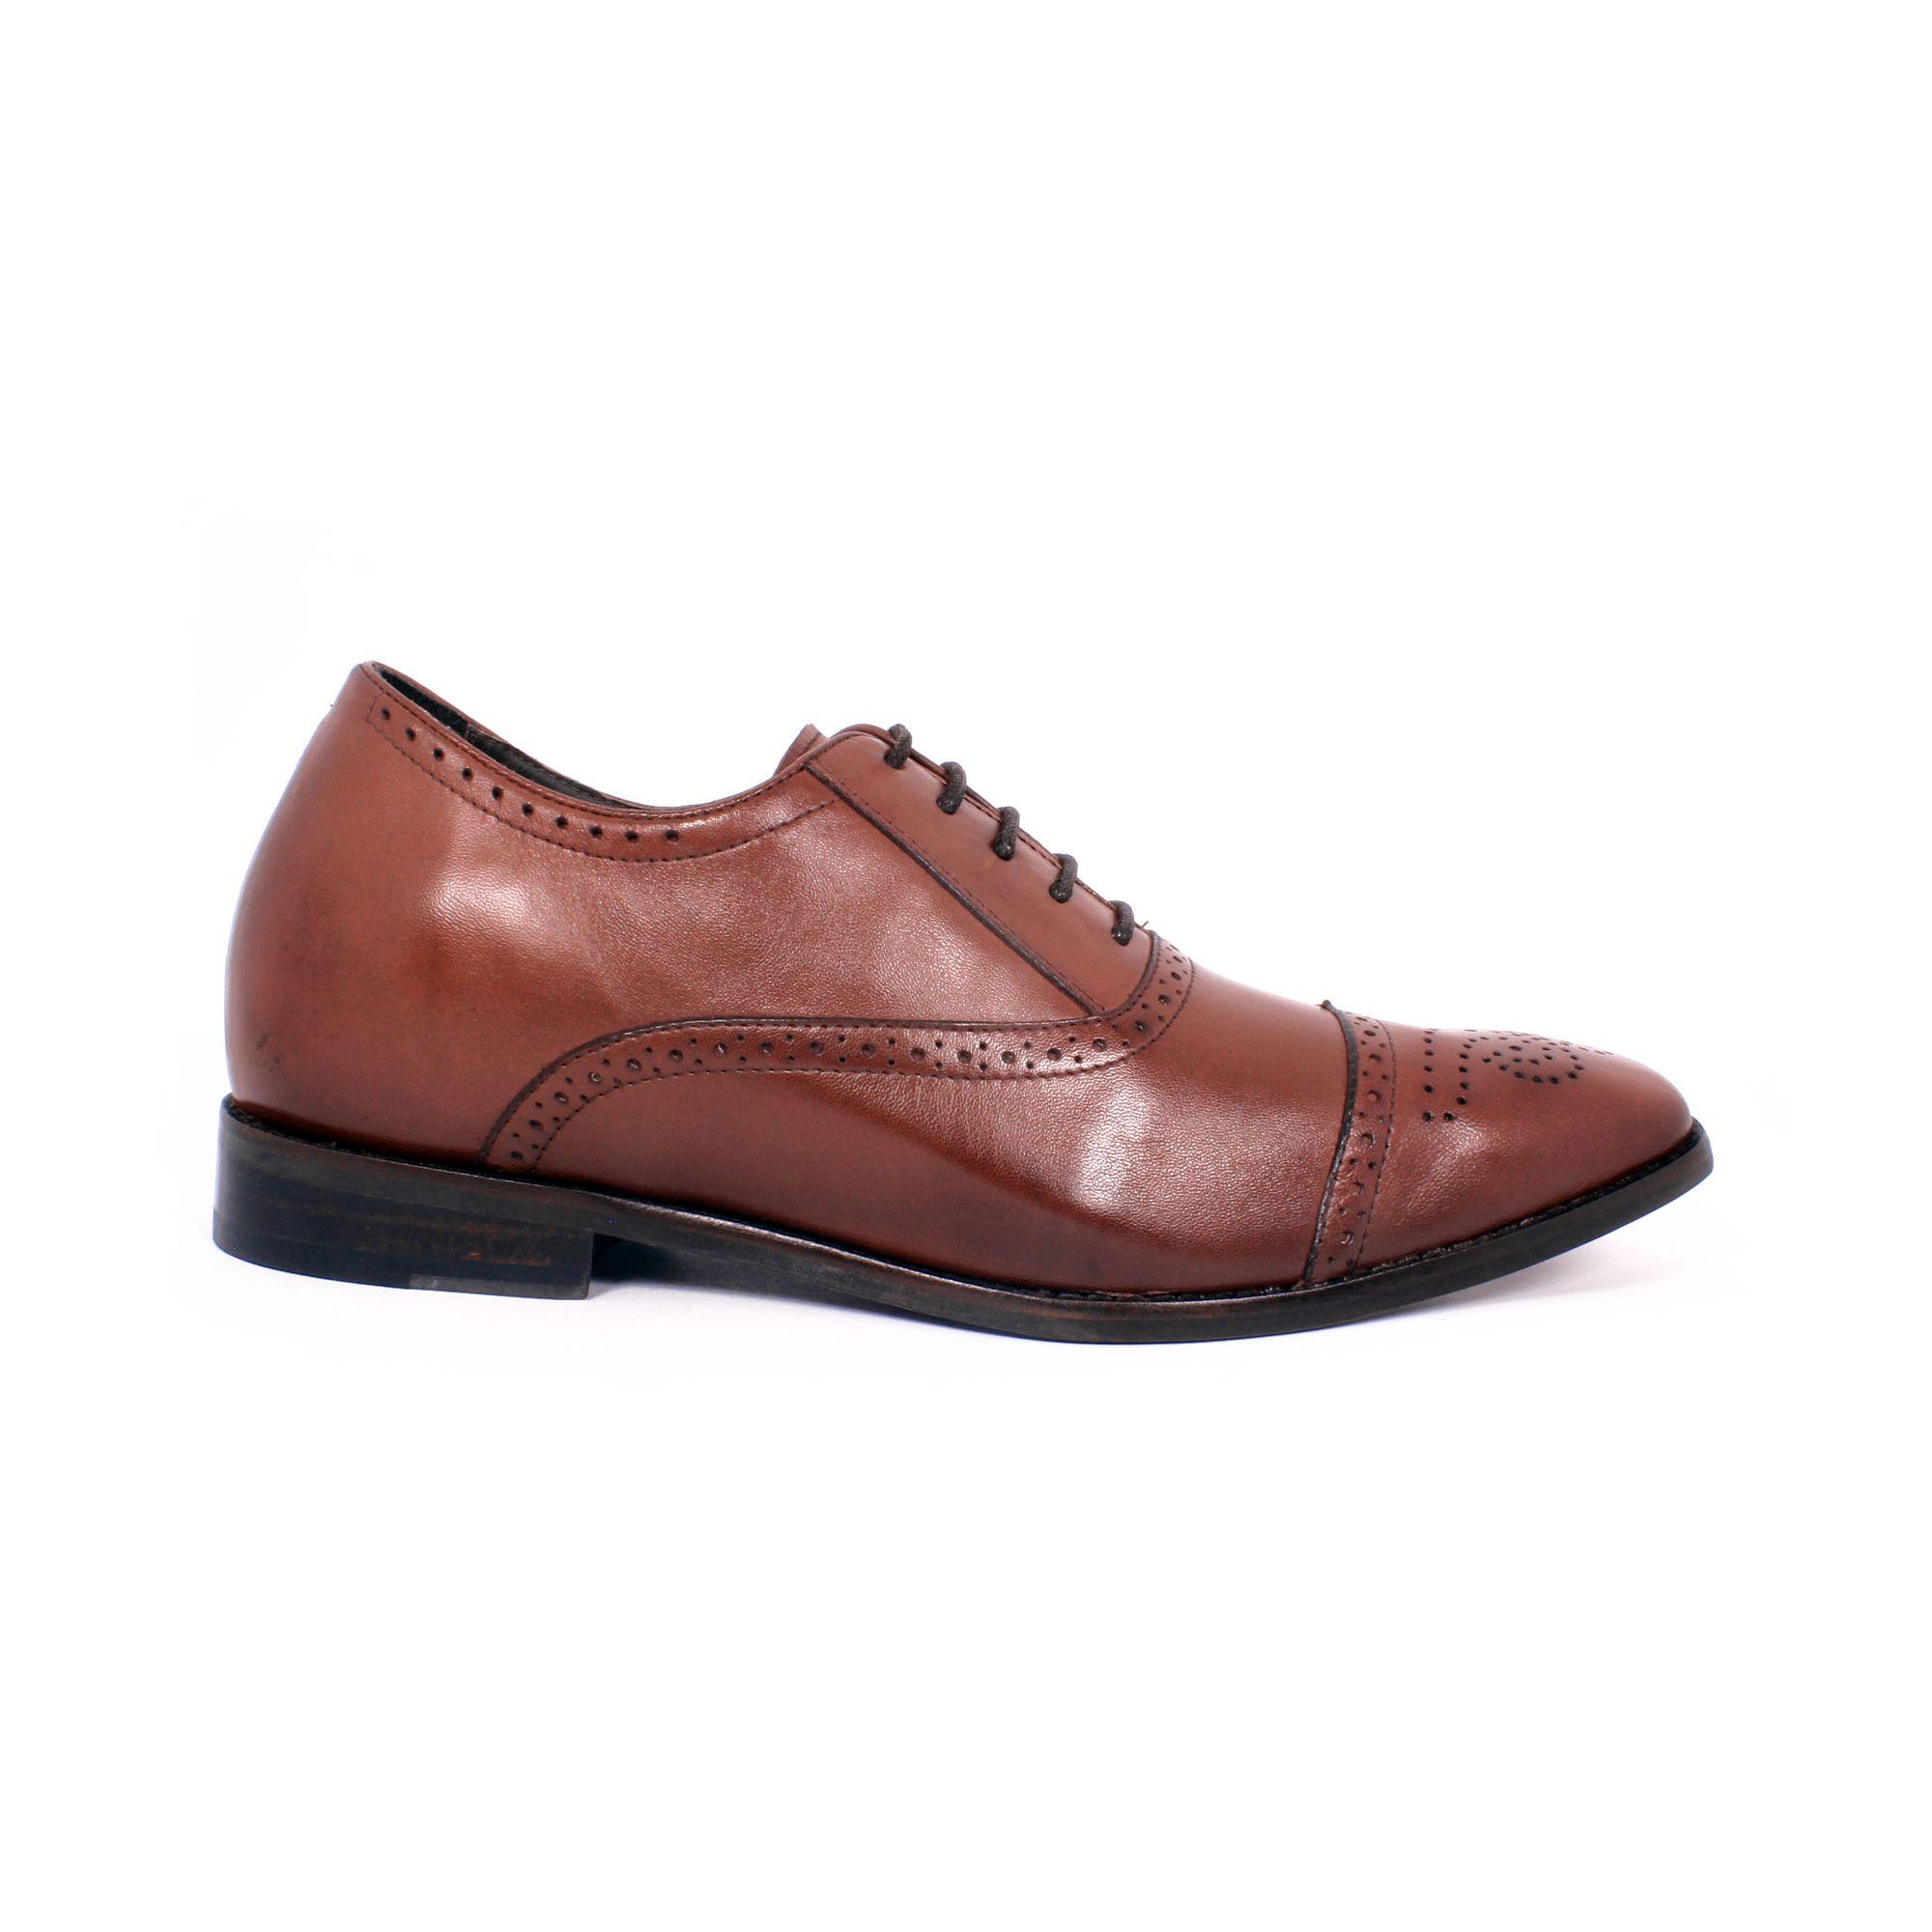 Zapato Formal British Café Max Denegri +7cms de Altura_70784